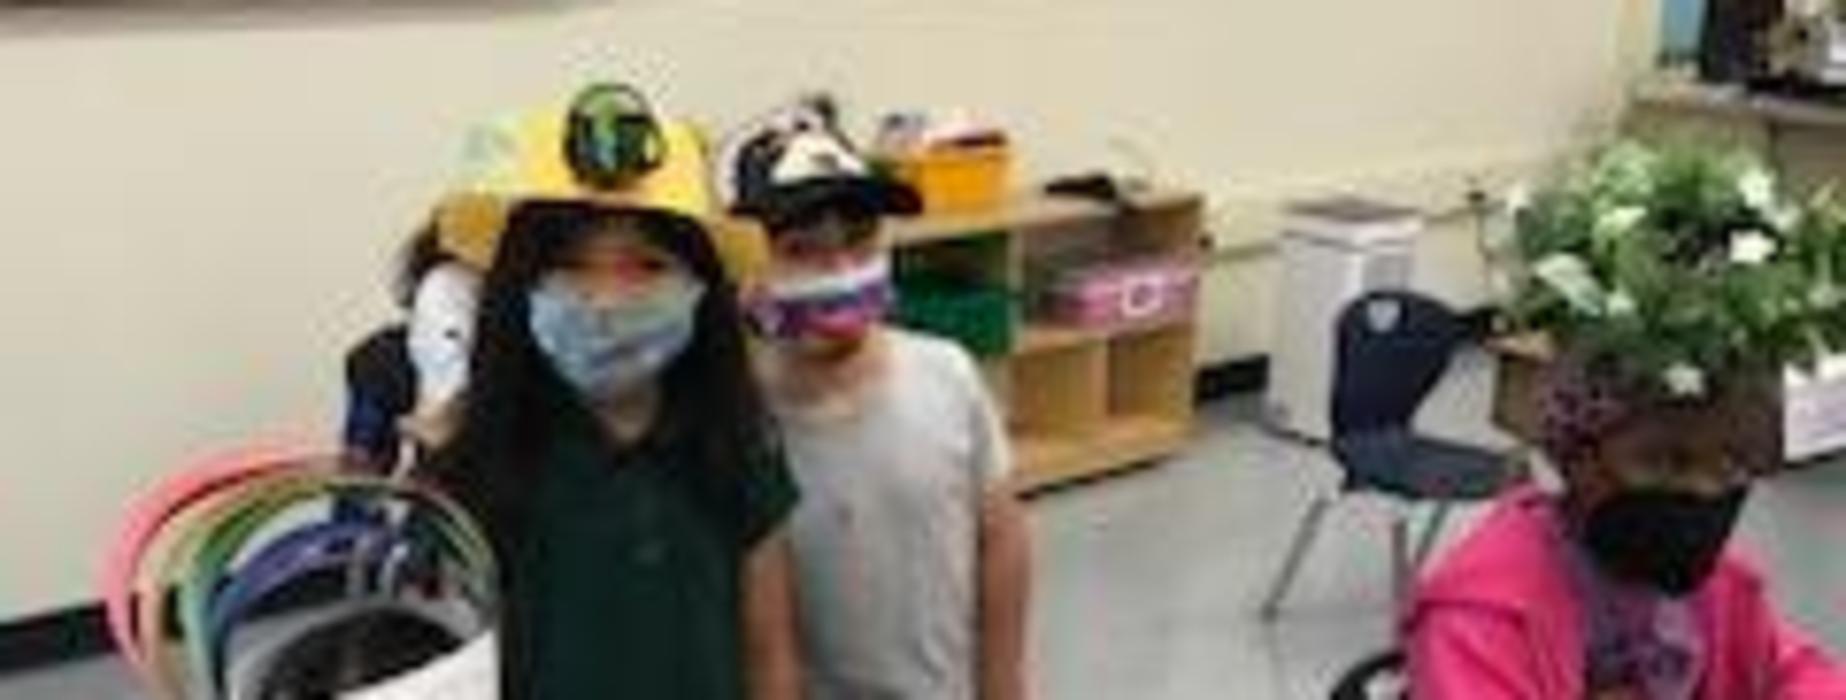 DI Kinder Camp celebrating Crazy Hat Day!